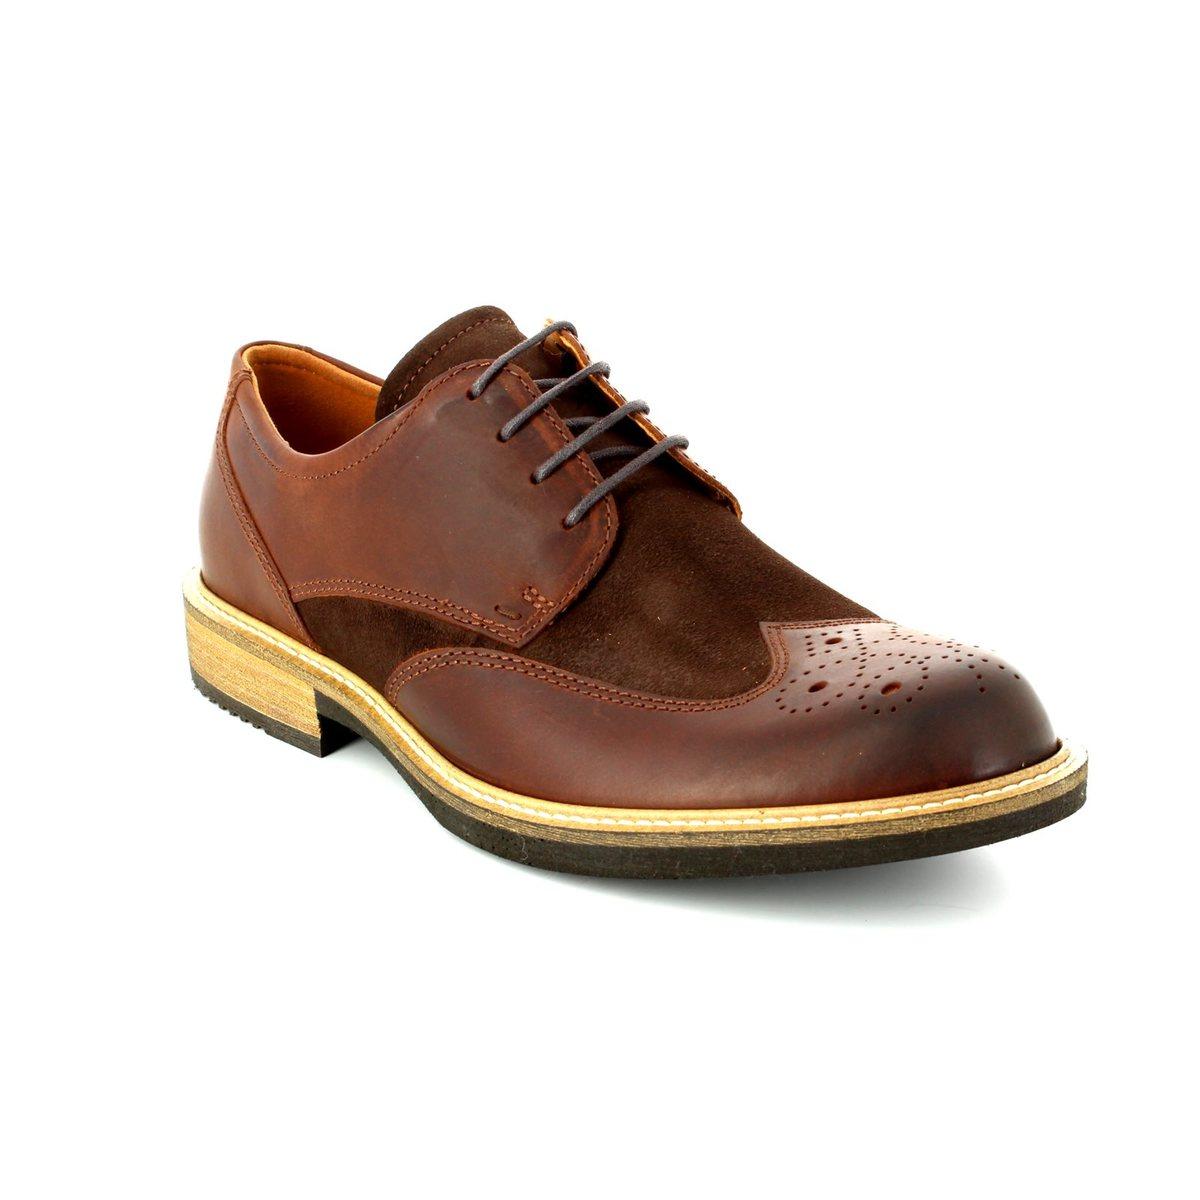 71b6a9cb6ab6 ECCO Kenton 512014-50255 Dark Tan formal shoes